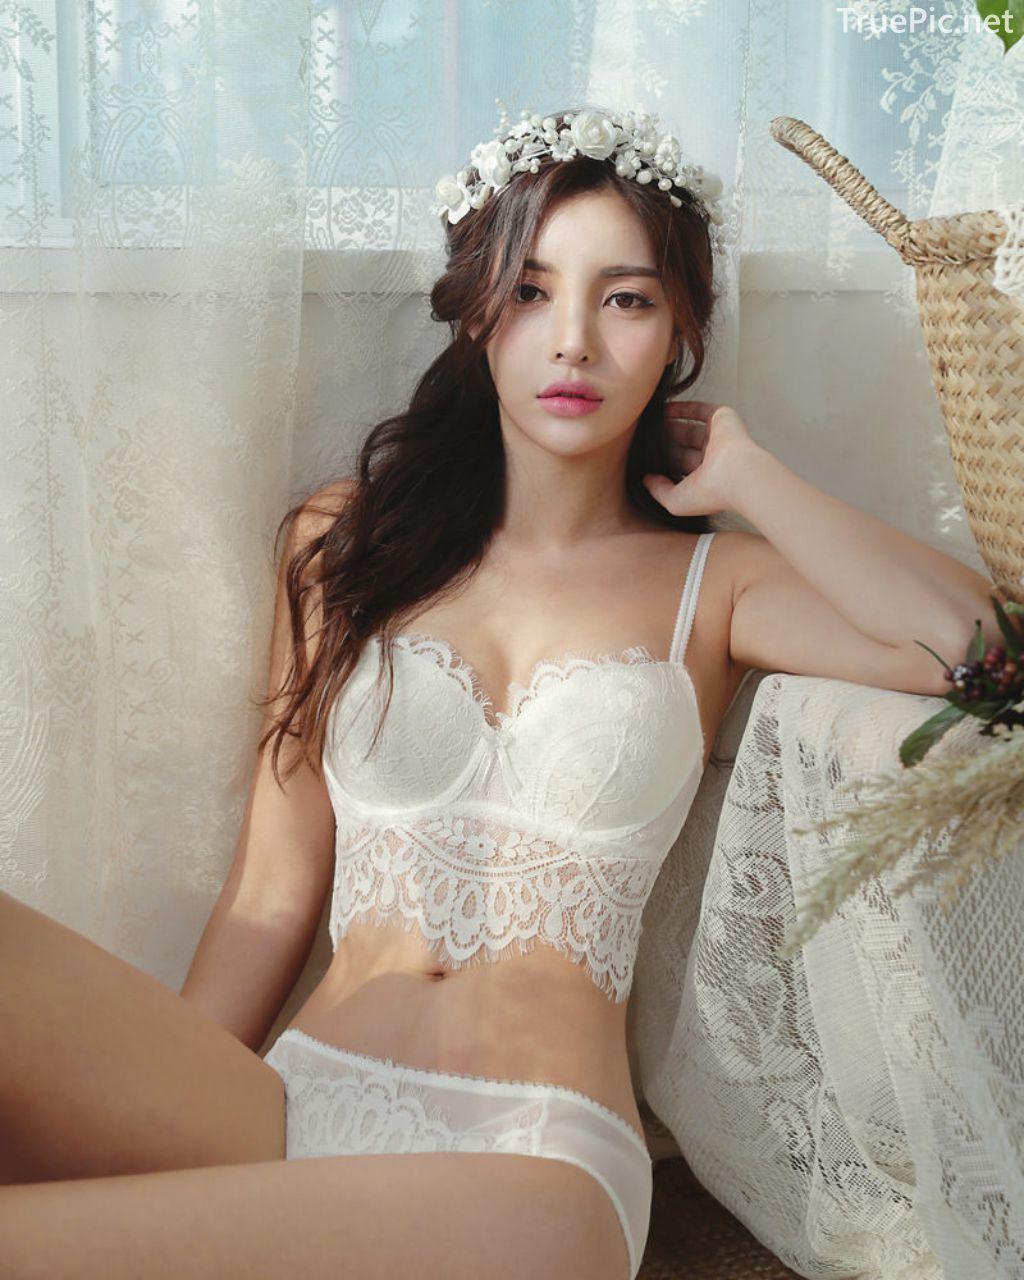 Korean Fashion Model - Jin Hee - Lovely Soft Lace Lingerie - TruePic.net - Picture 7